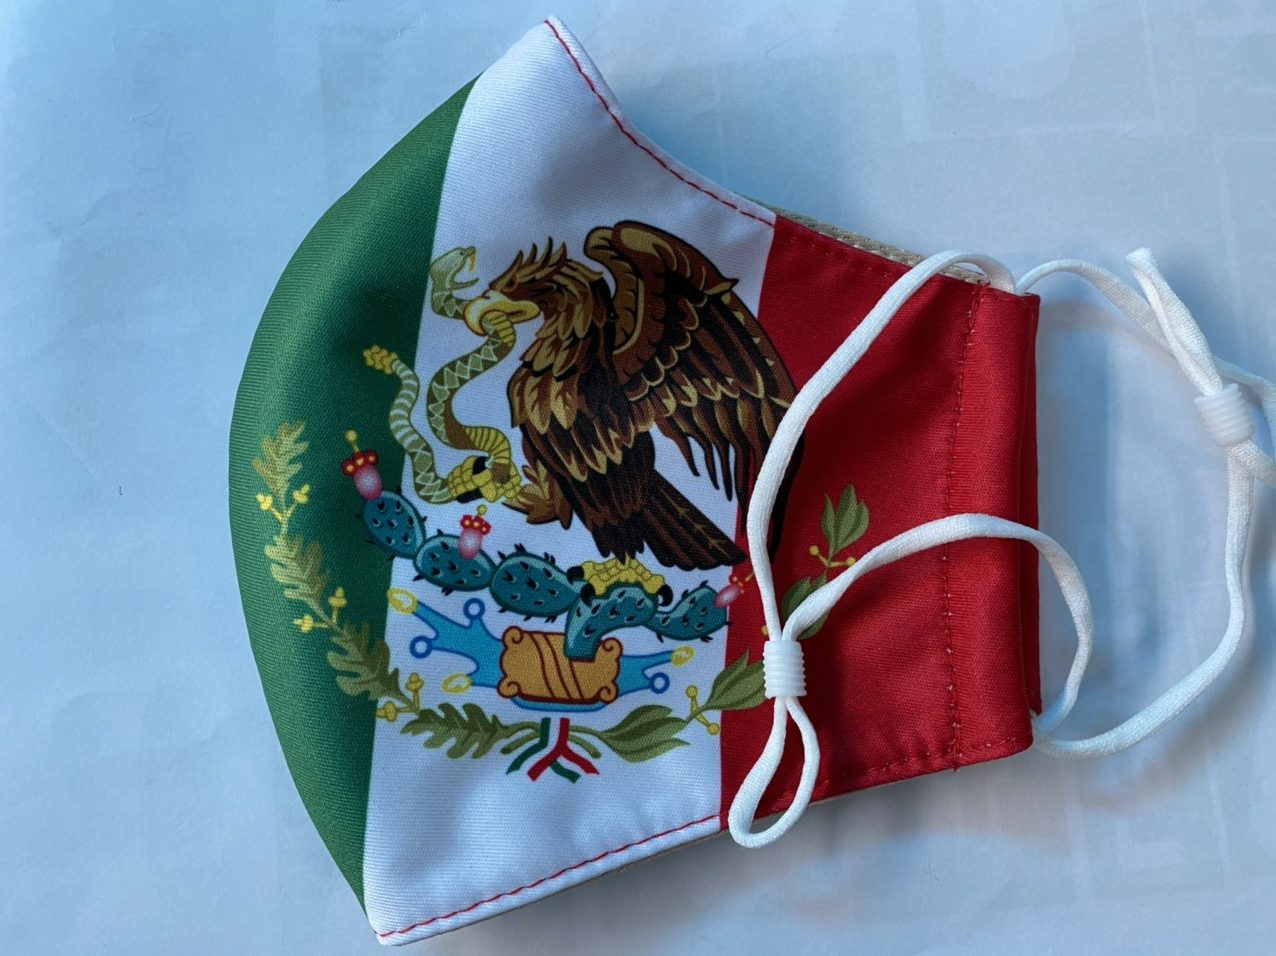 Khẩu Trang In Logo Quốc Huy Mexico 2 Lớp - Mẫu Khẩu Trang In 3D Cờ Mexico 6